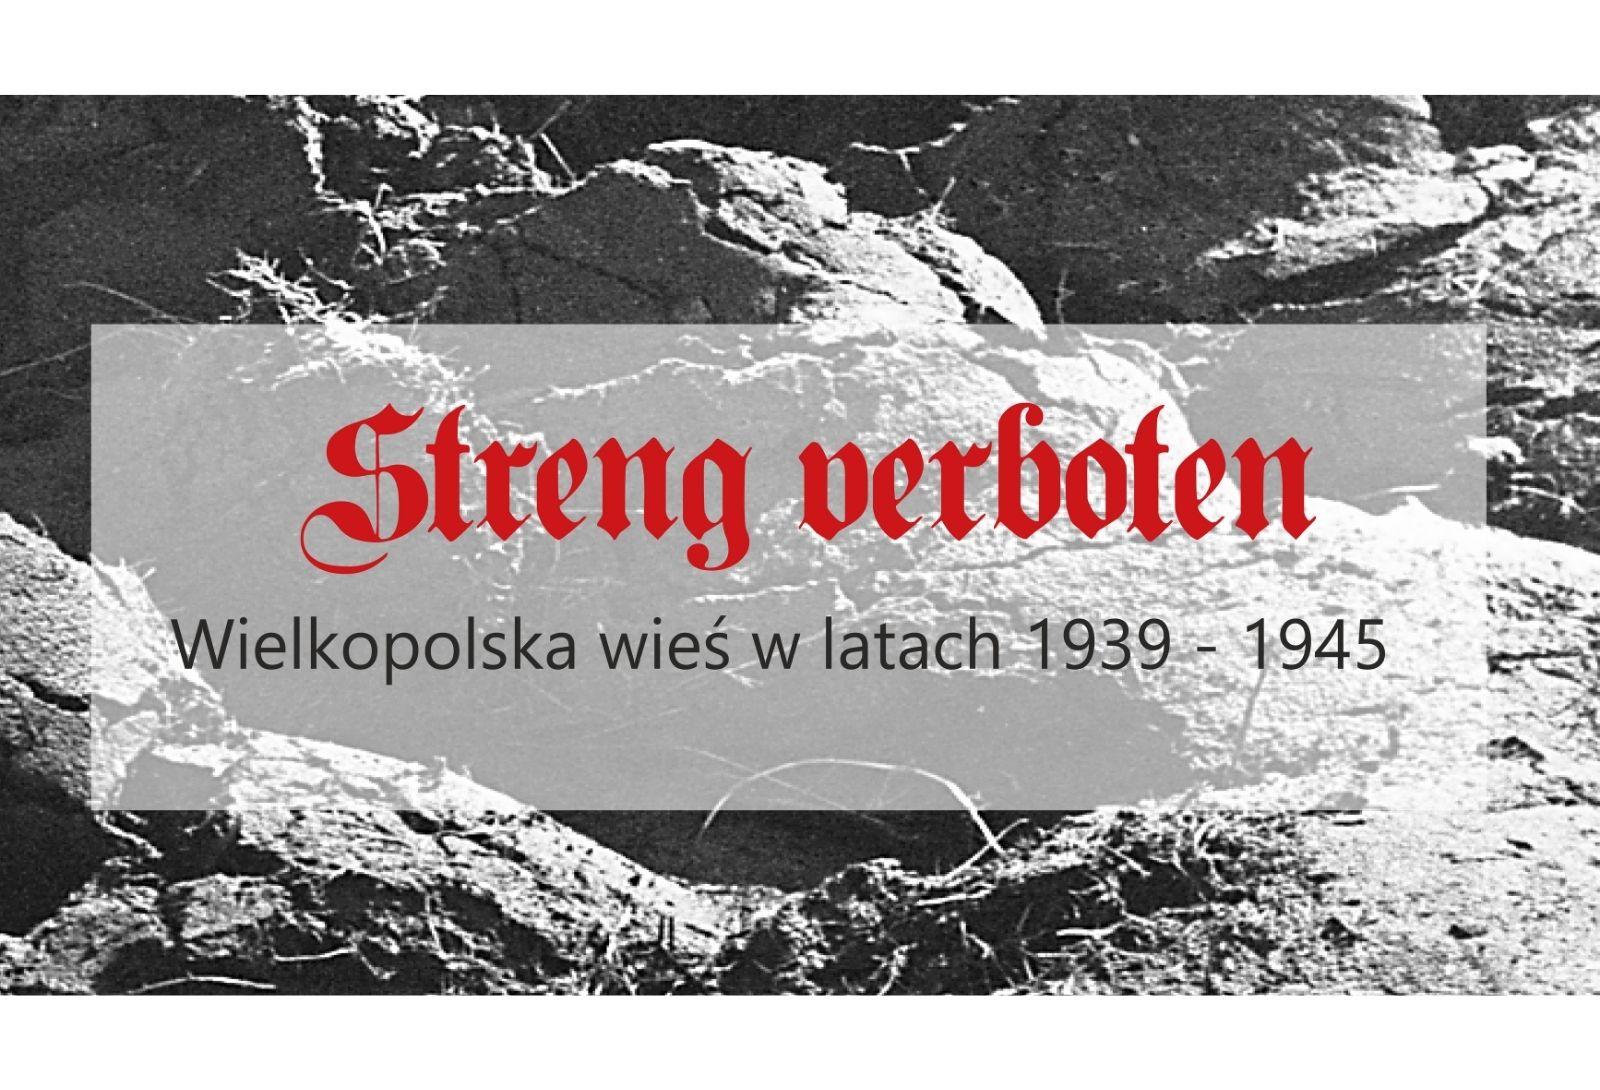 Streng verboten. Wielkopolska wieś w latach 1939-1945